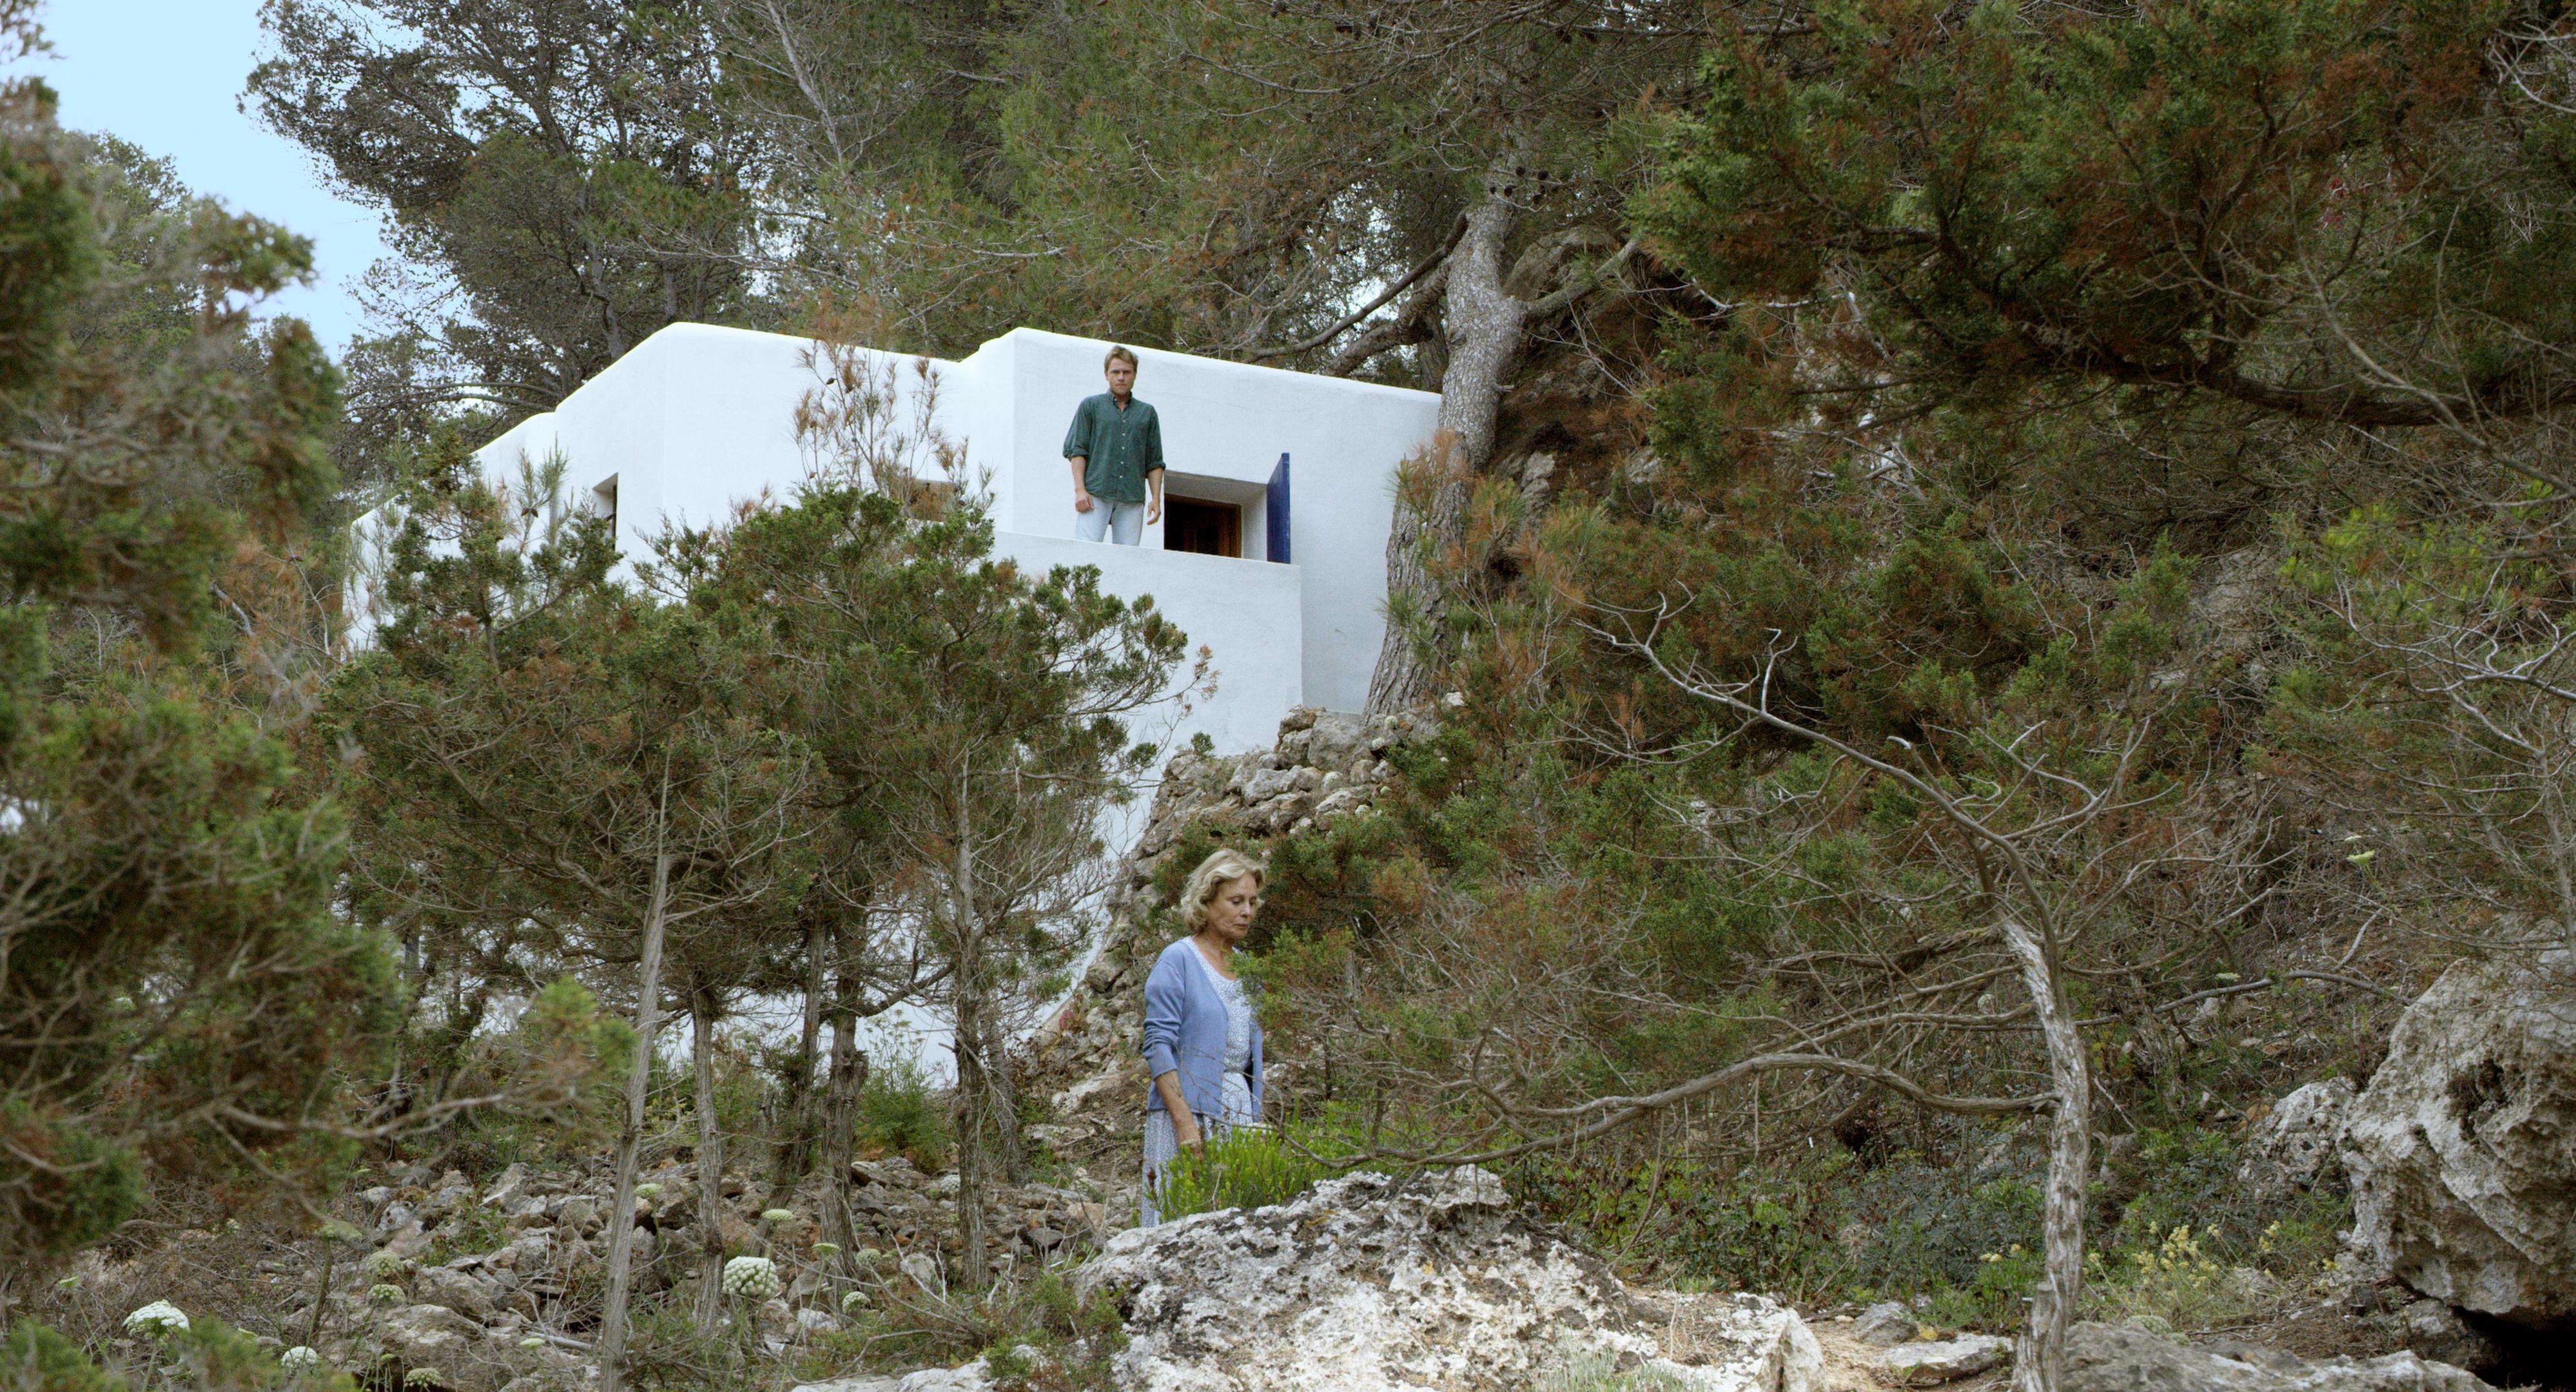 Amnesia: Marthe Keller e Max Riemelt in una sequenza del film di Barbet Schroeder